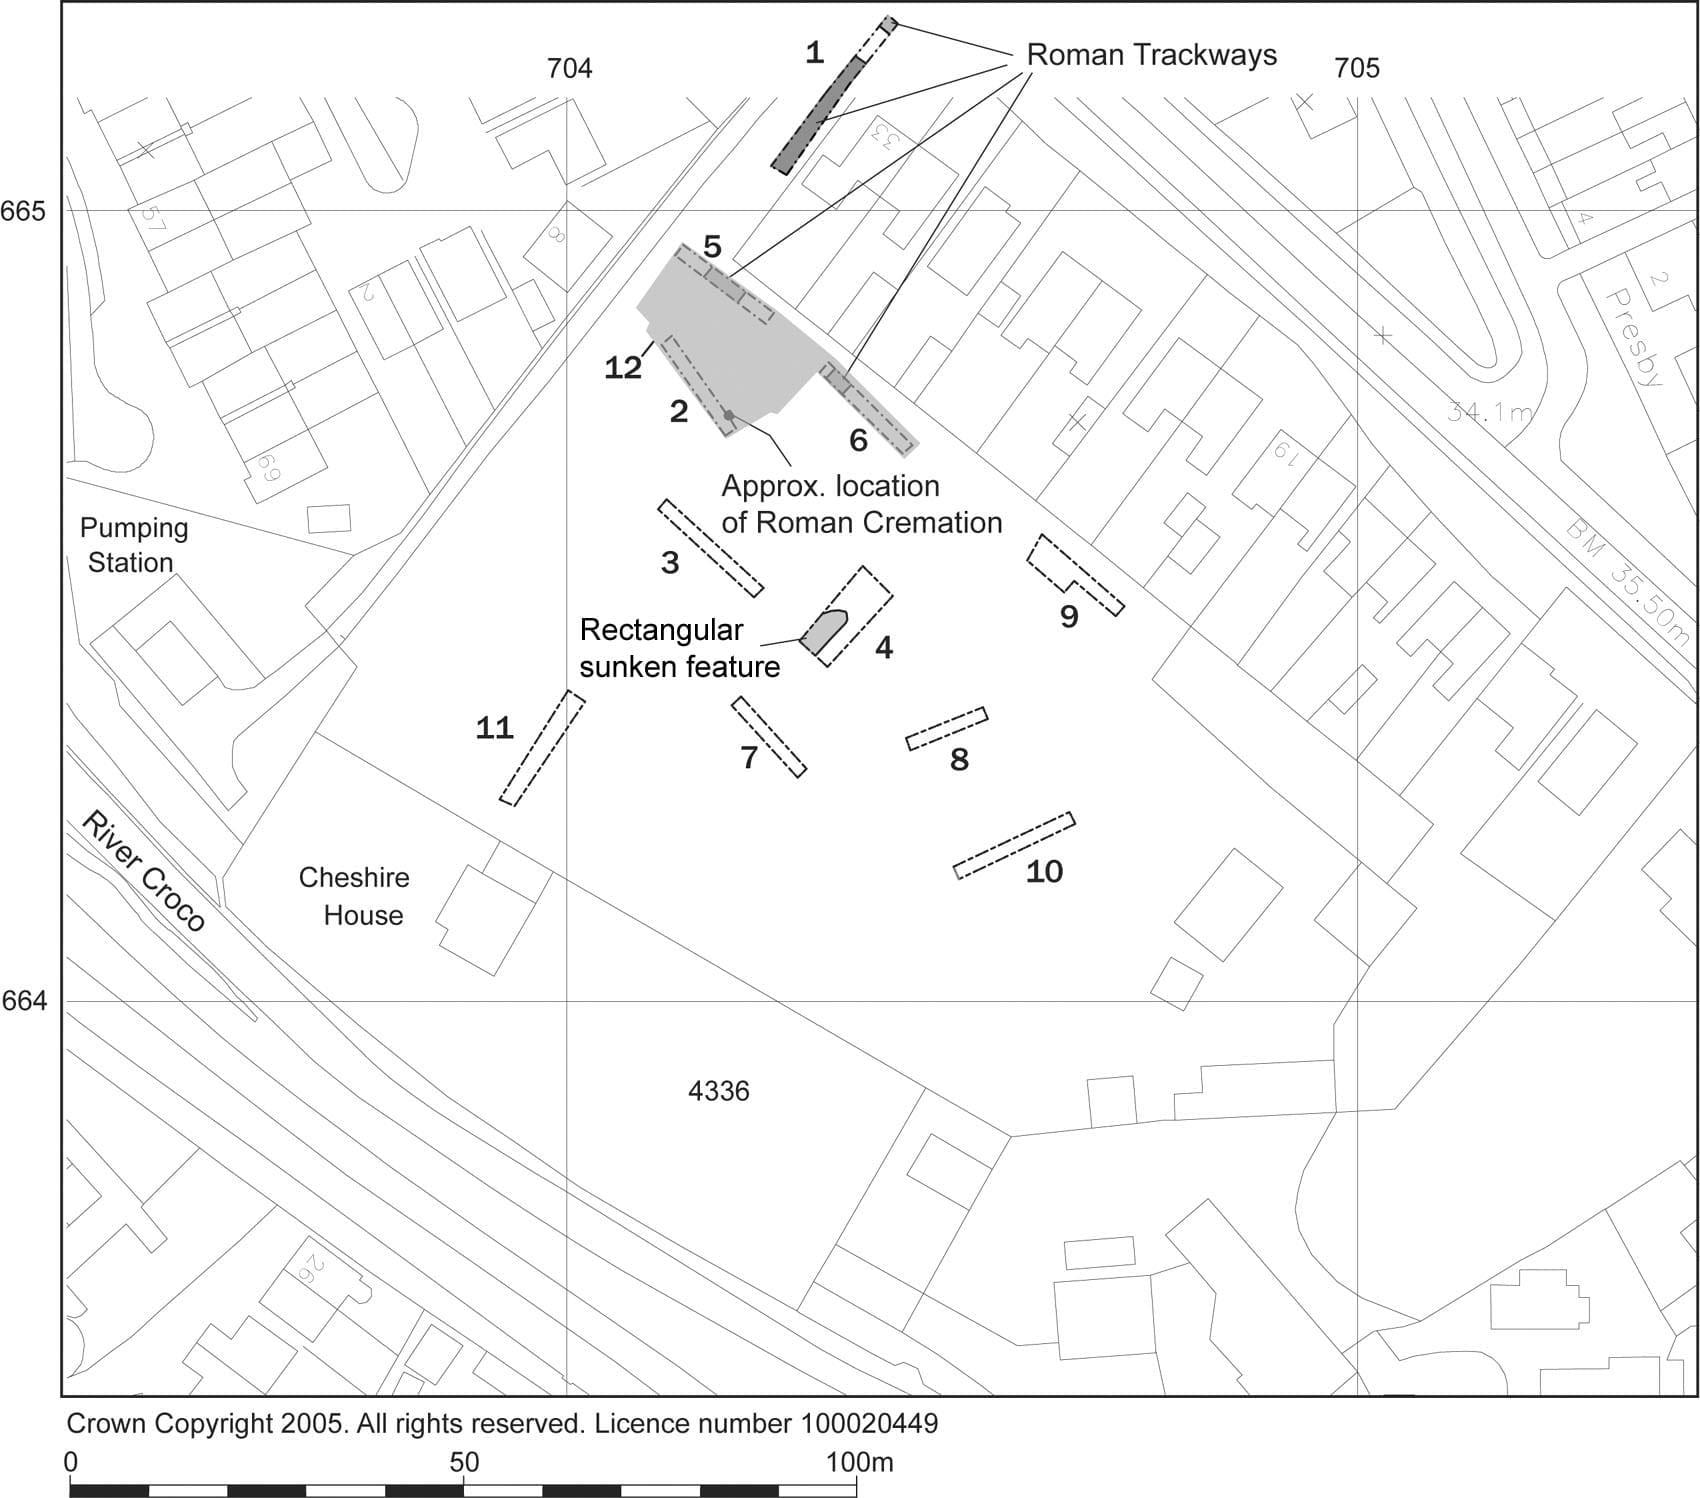 Location of Excavation Areas